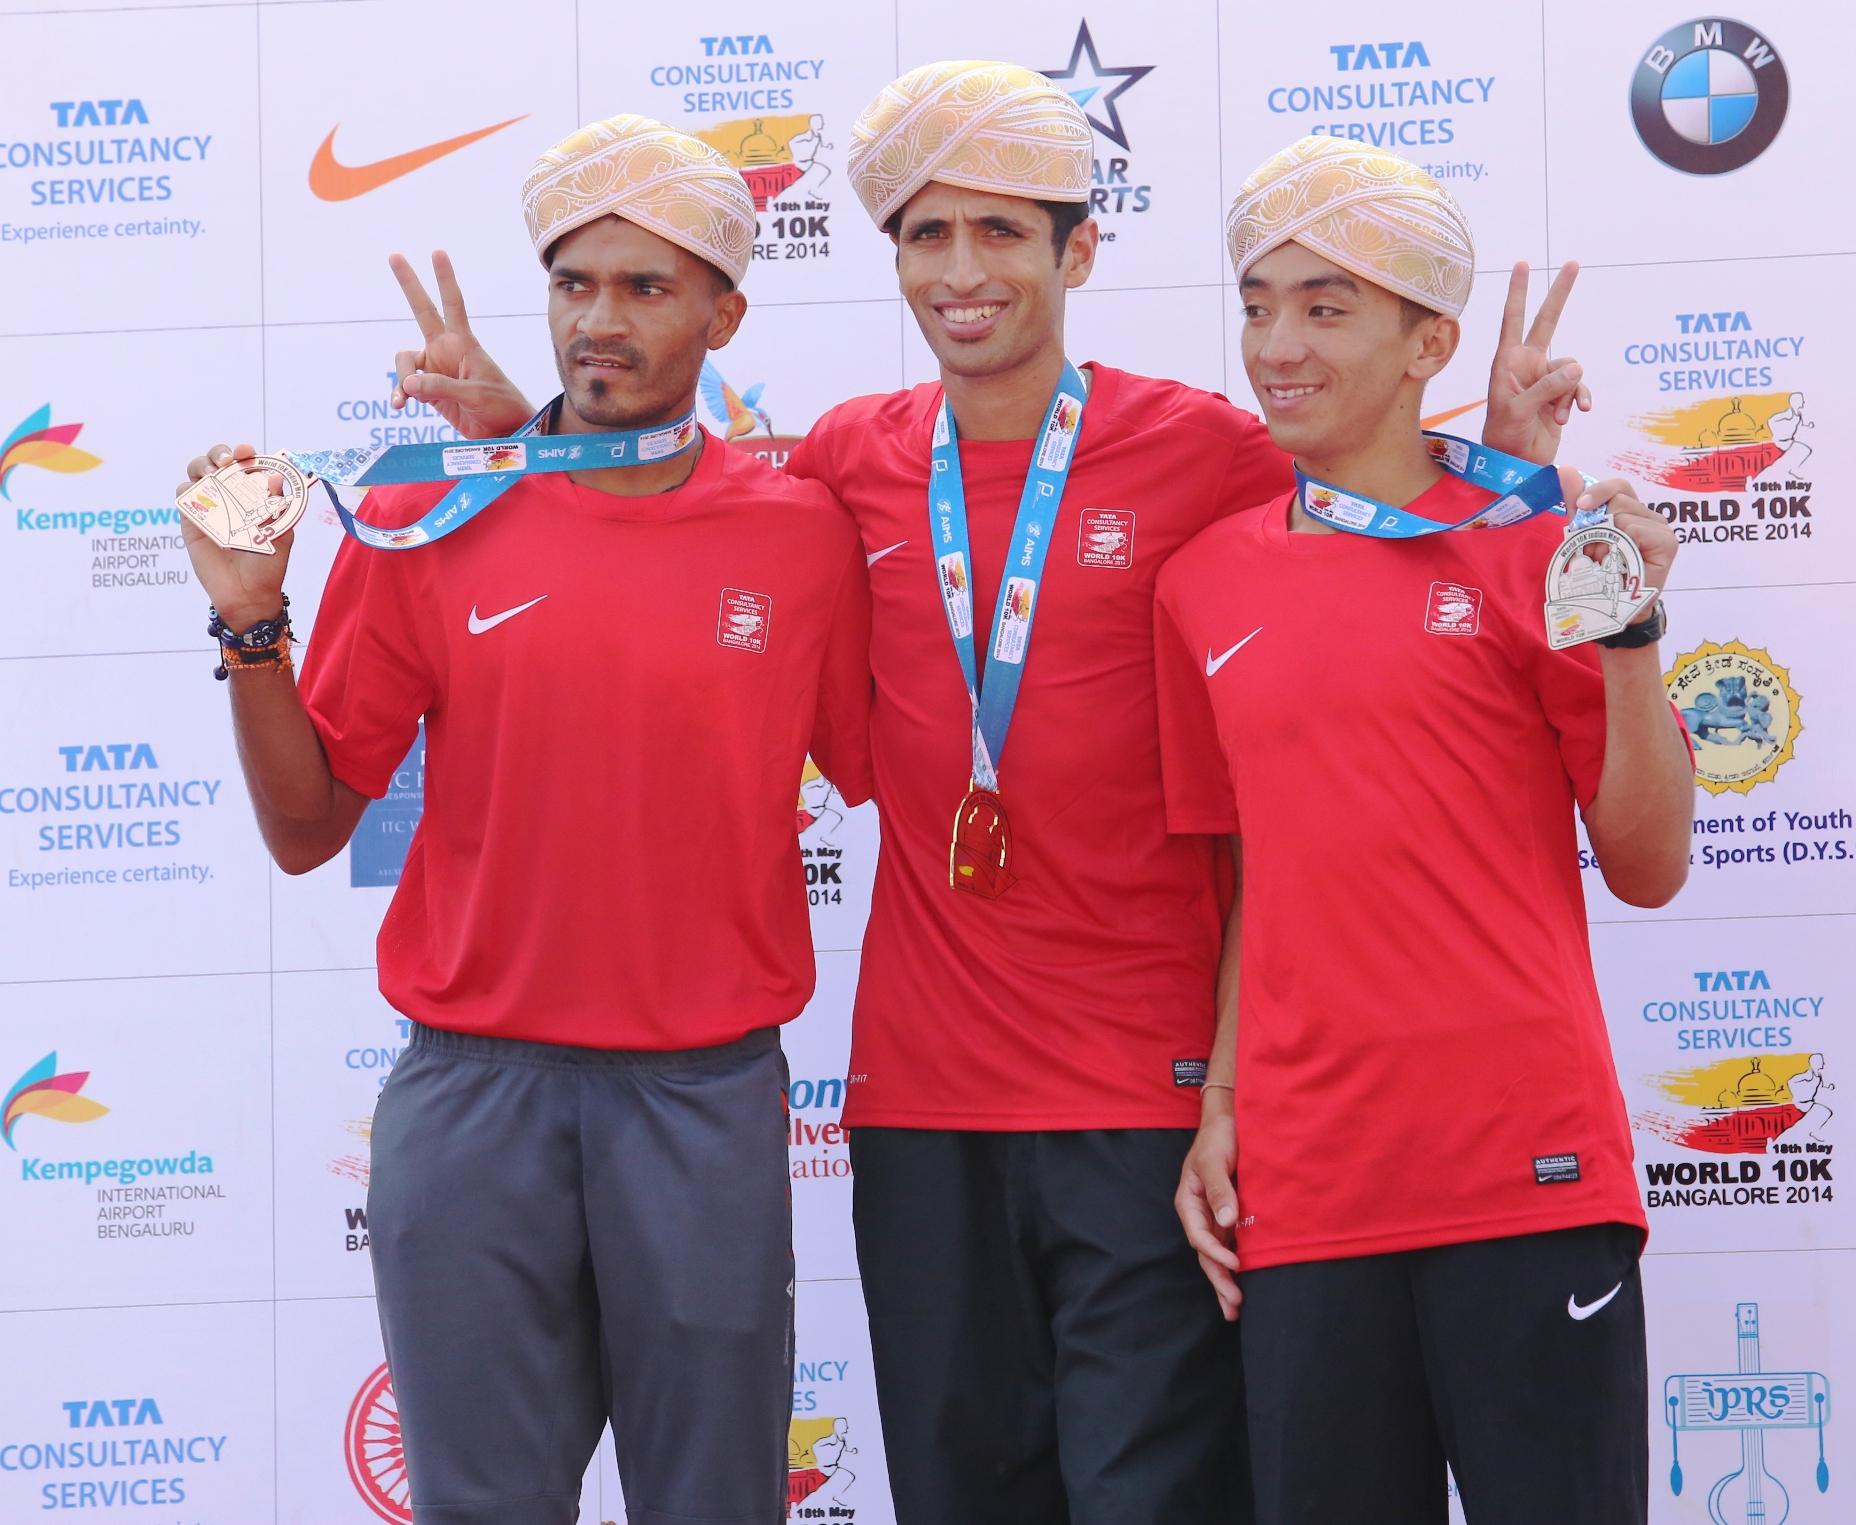 The Indian men's winners of the TCS World 10K Bangalore, 2014 (from left) 1st runner up Nitendra Singh Rawat, Winner B. C. Tilak and 2nd runner up Anish Thapa.